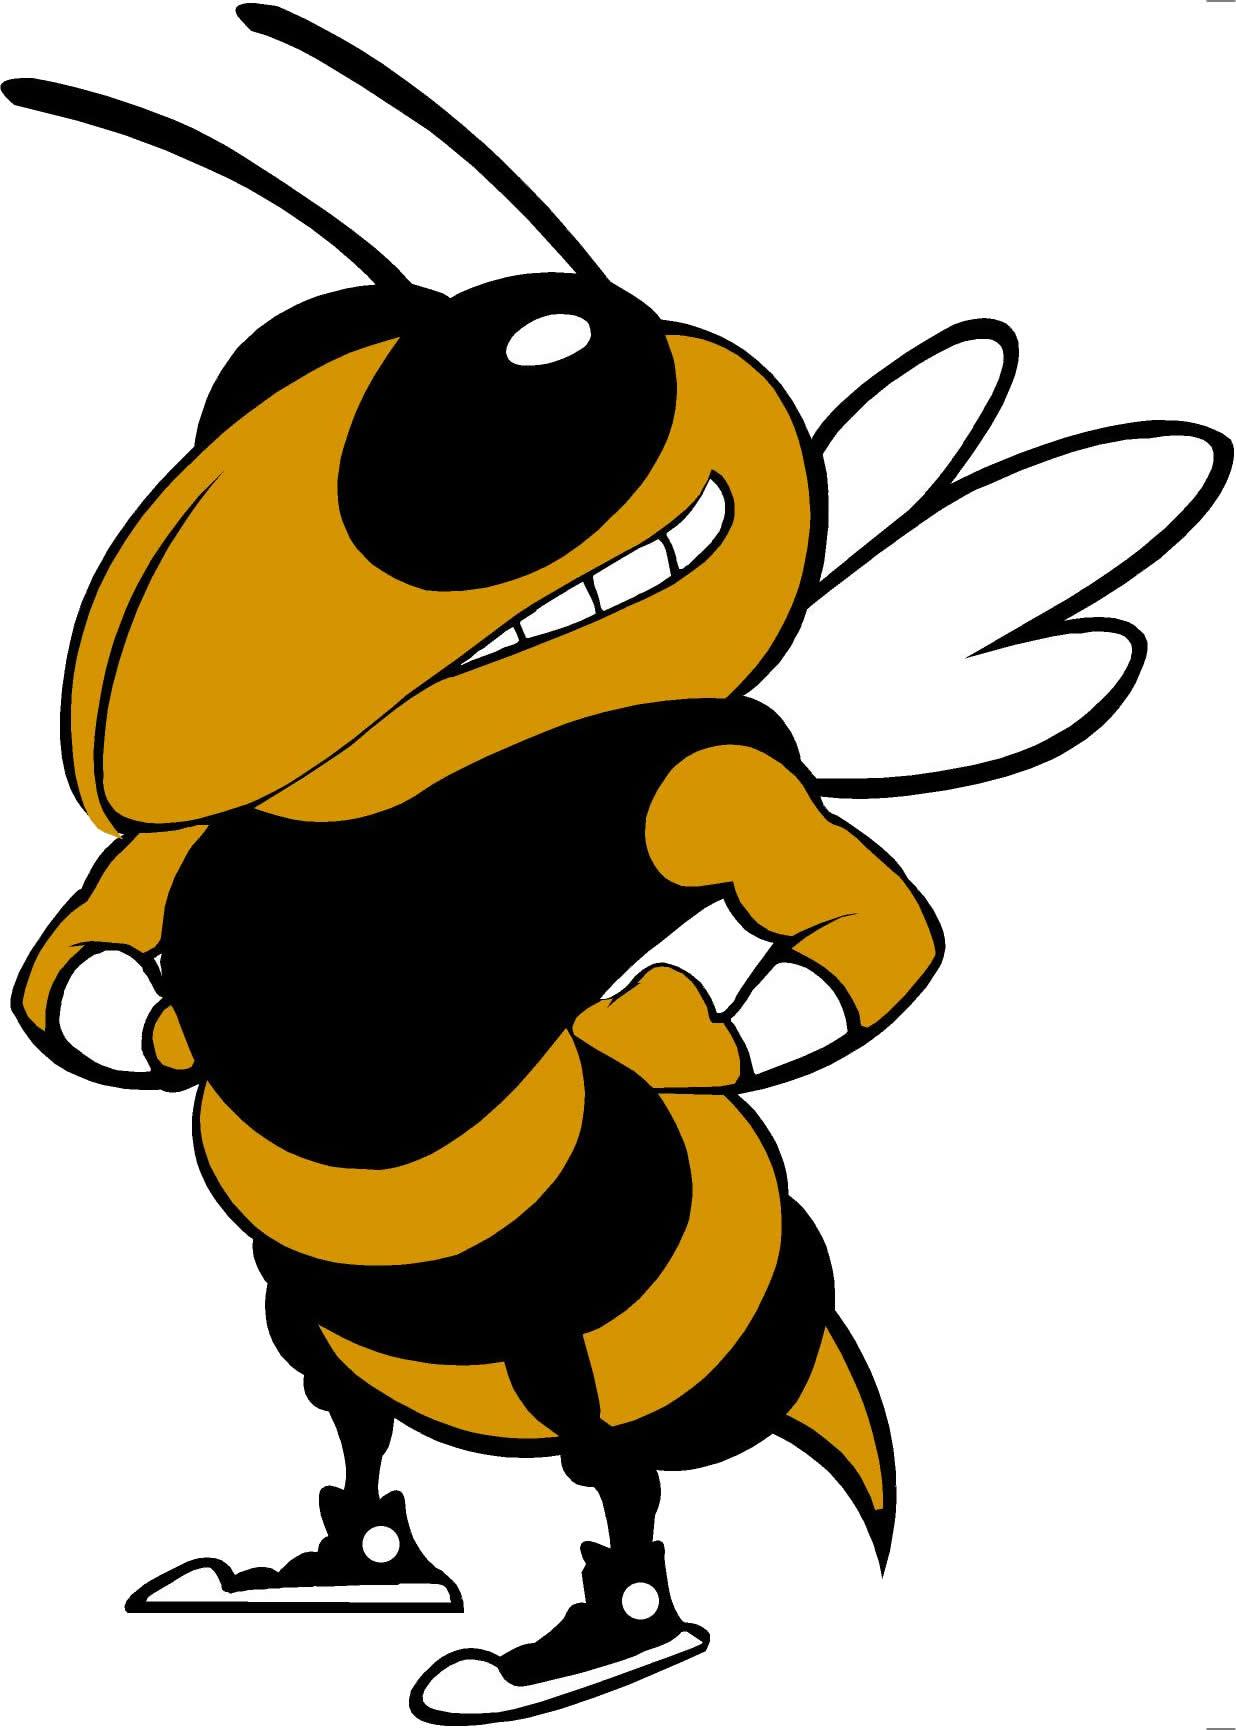 Yellow Jacket Athletics Thomas County Central High School